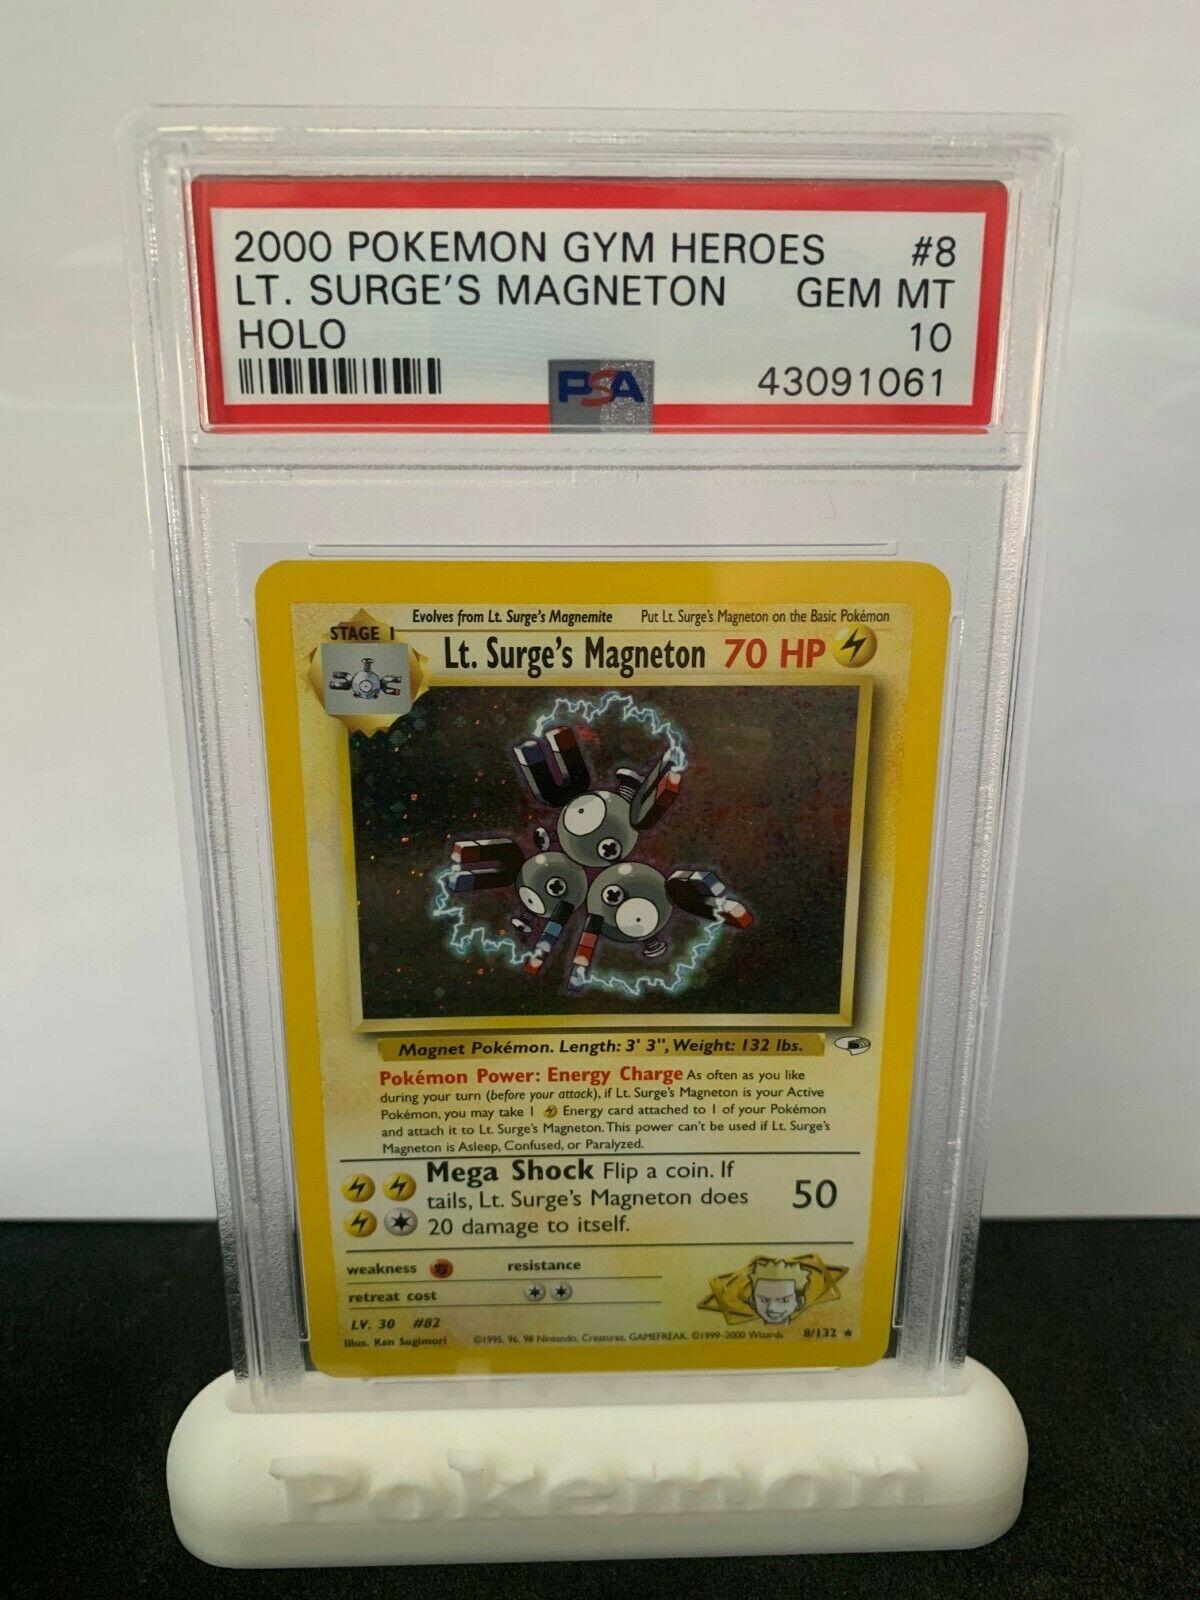 Pokemon PSA 10 Gym Heroes Lt Surges Magneton Holo Rare Mint 8